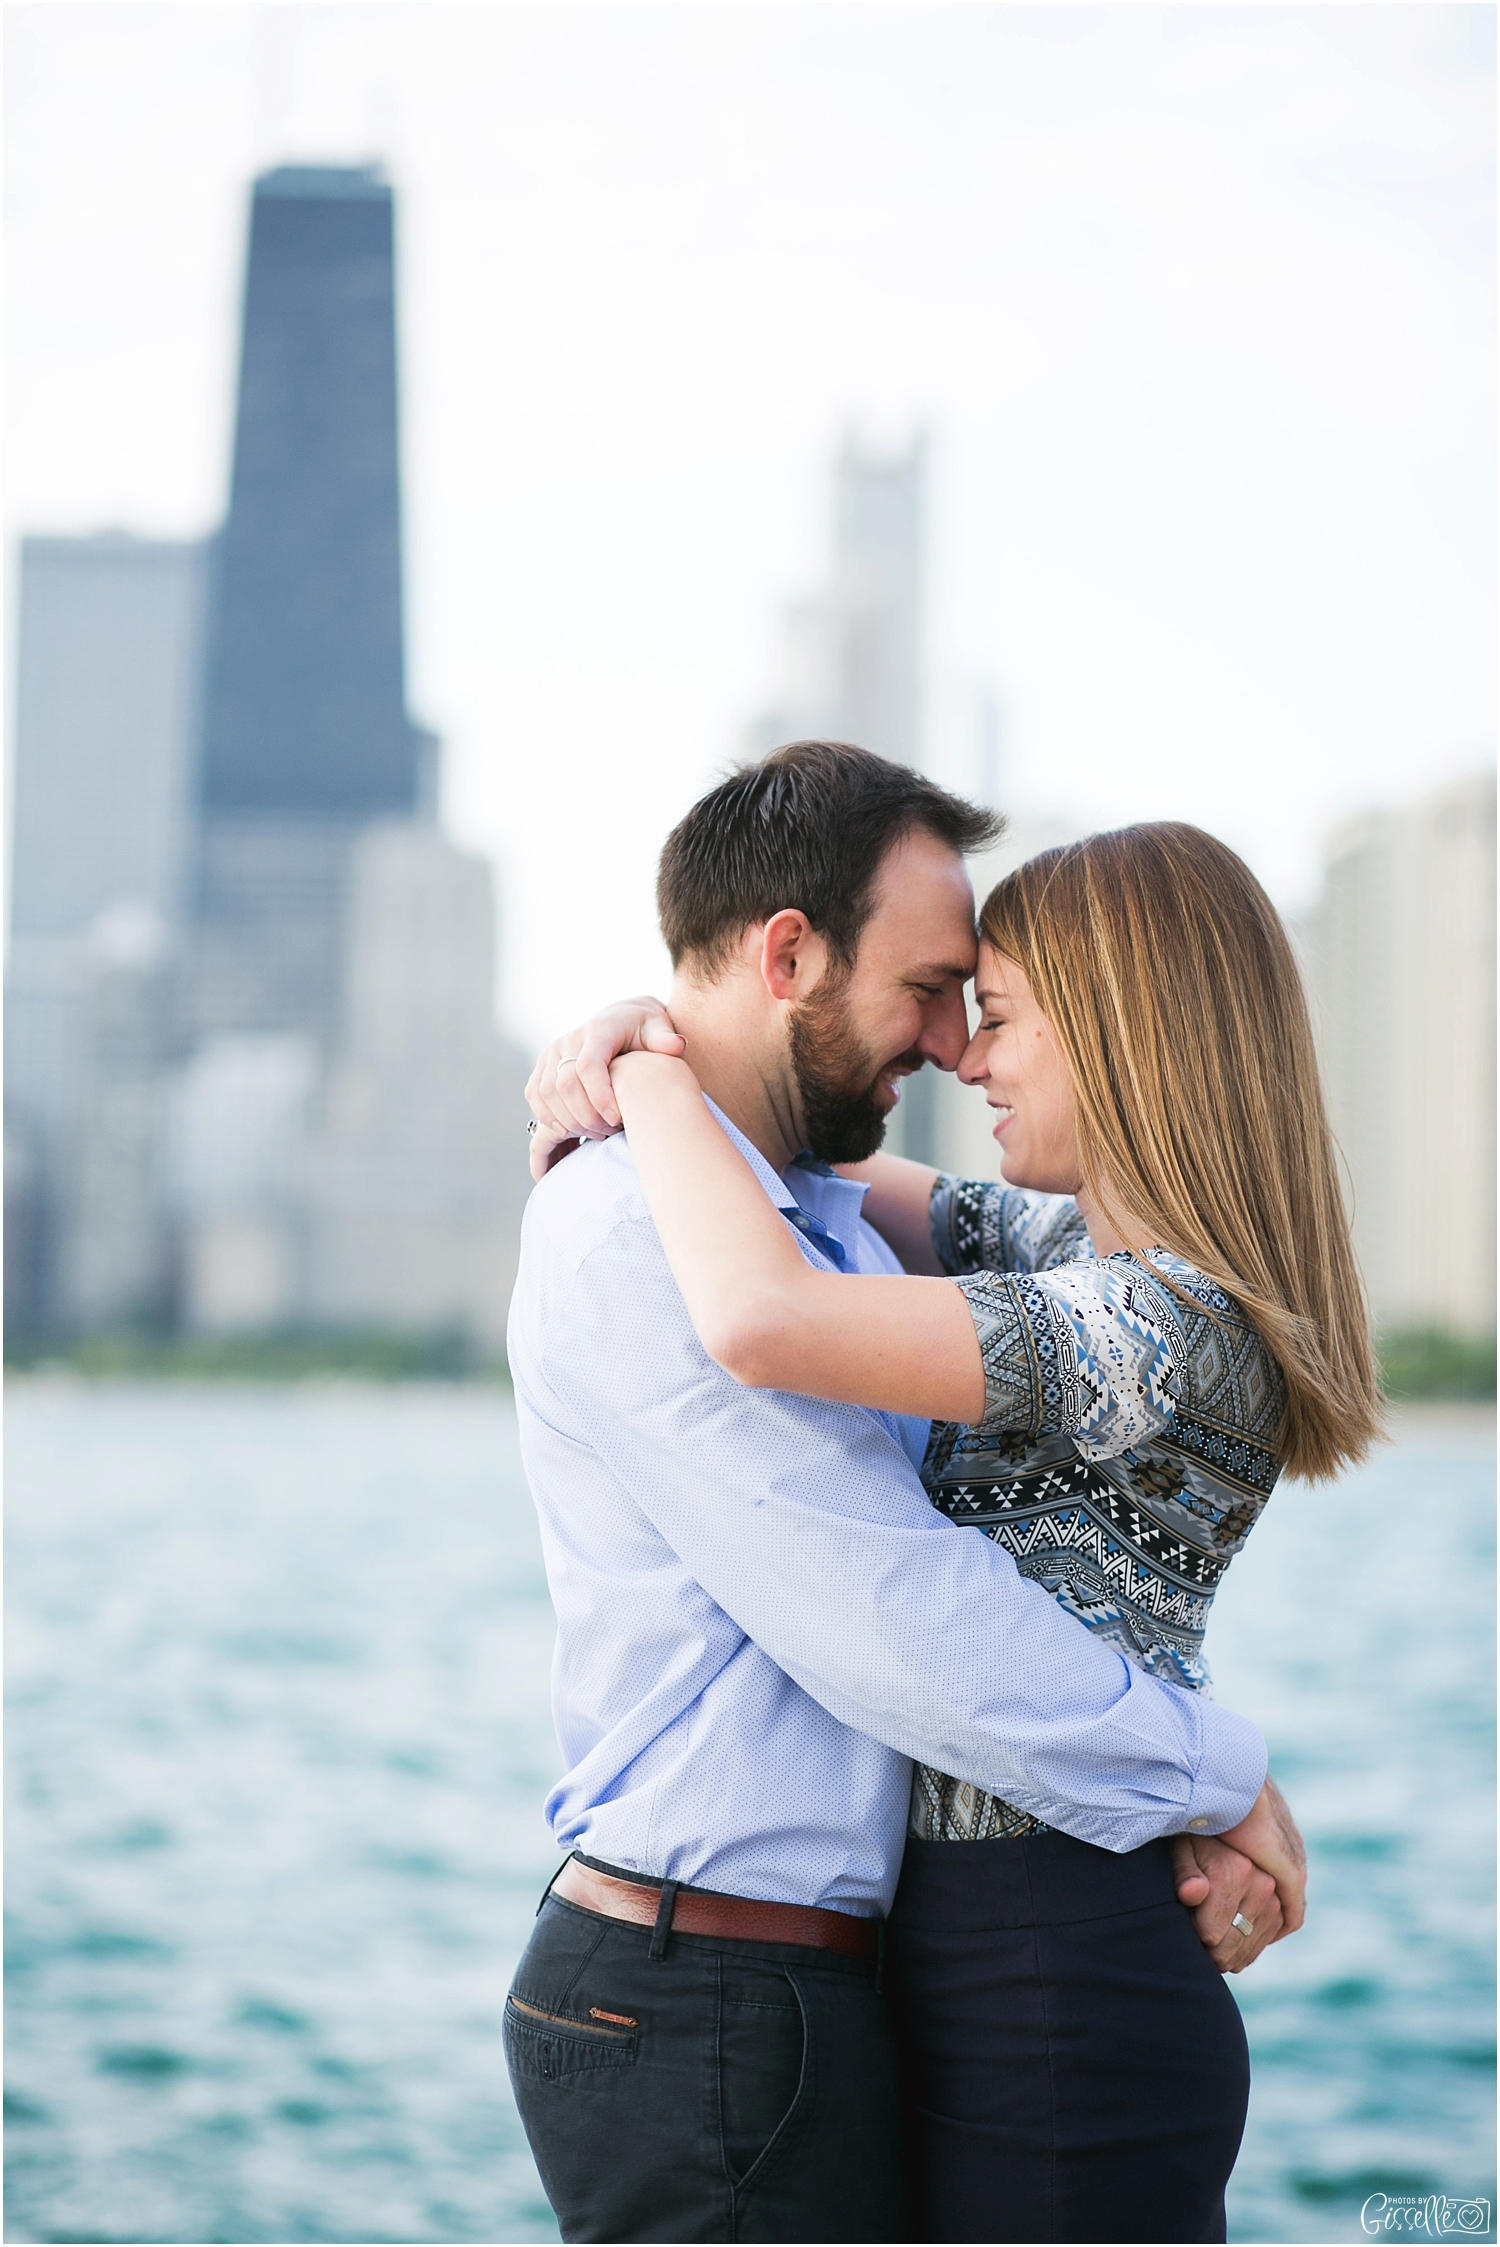 Chicago Engagement Session_0324.jpg